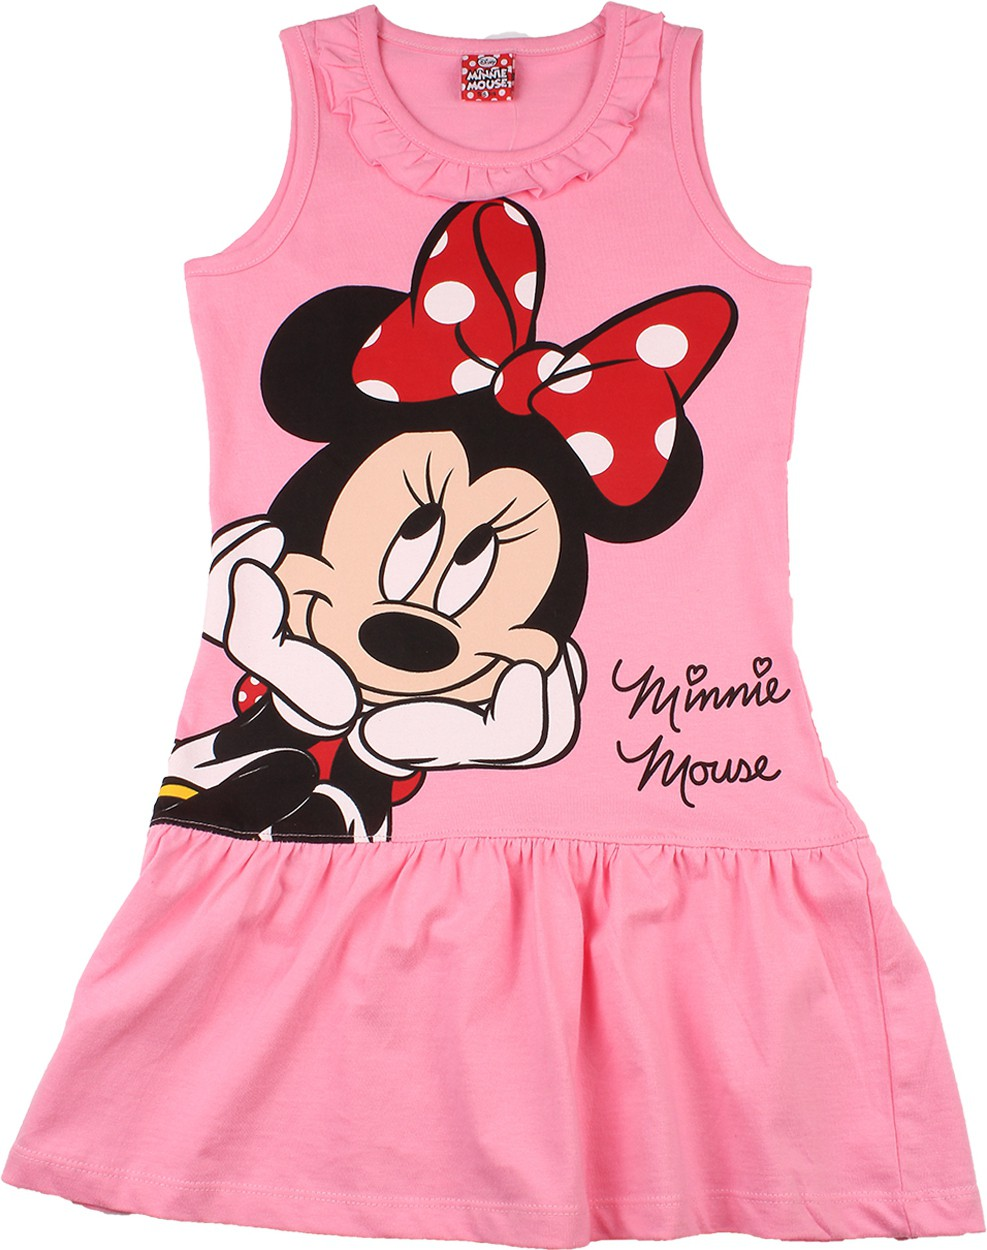 Deals | Girls Clothing Disney